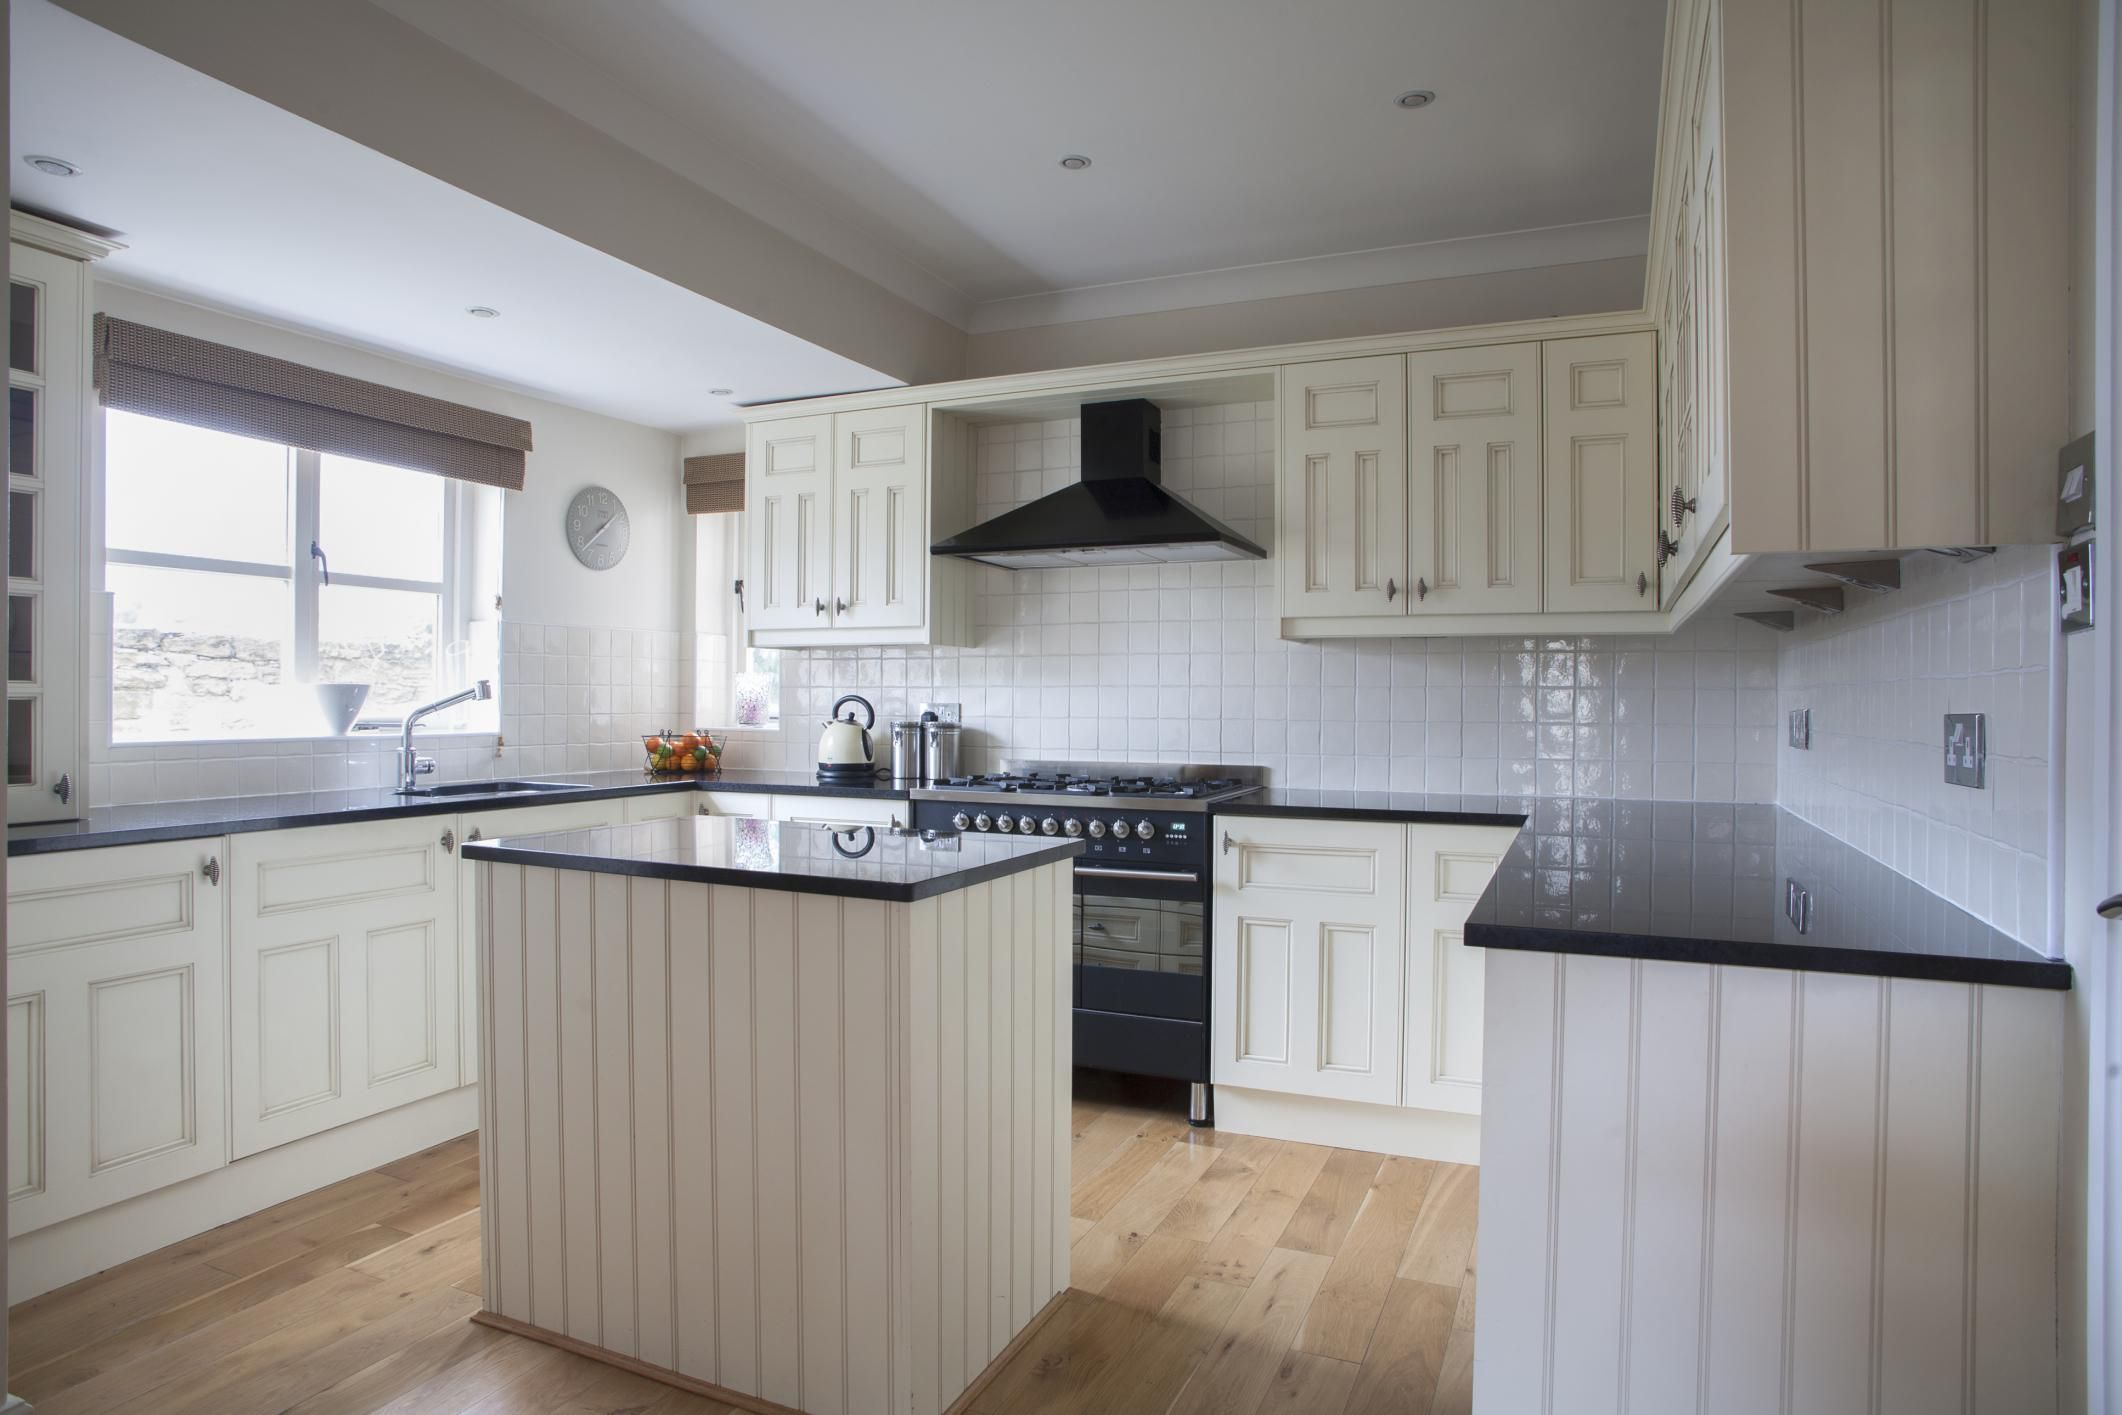 7 ways to cut your kitchen remodel bill in half kitchens